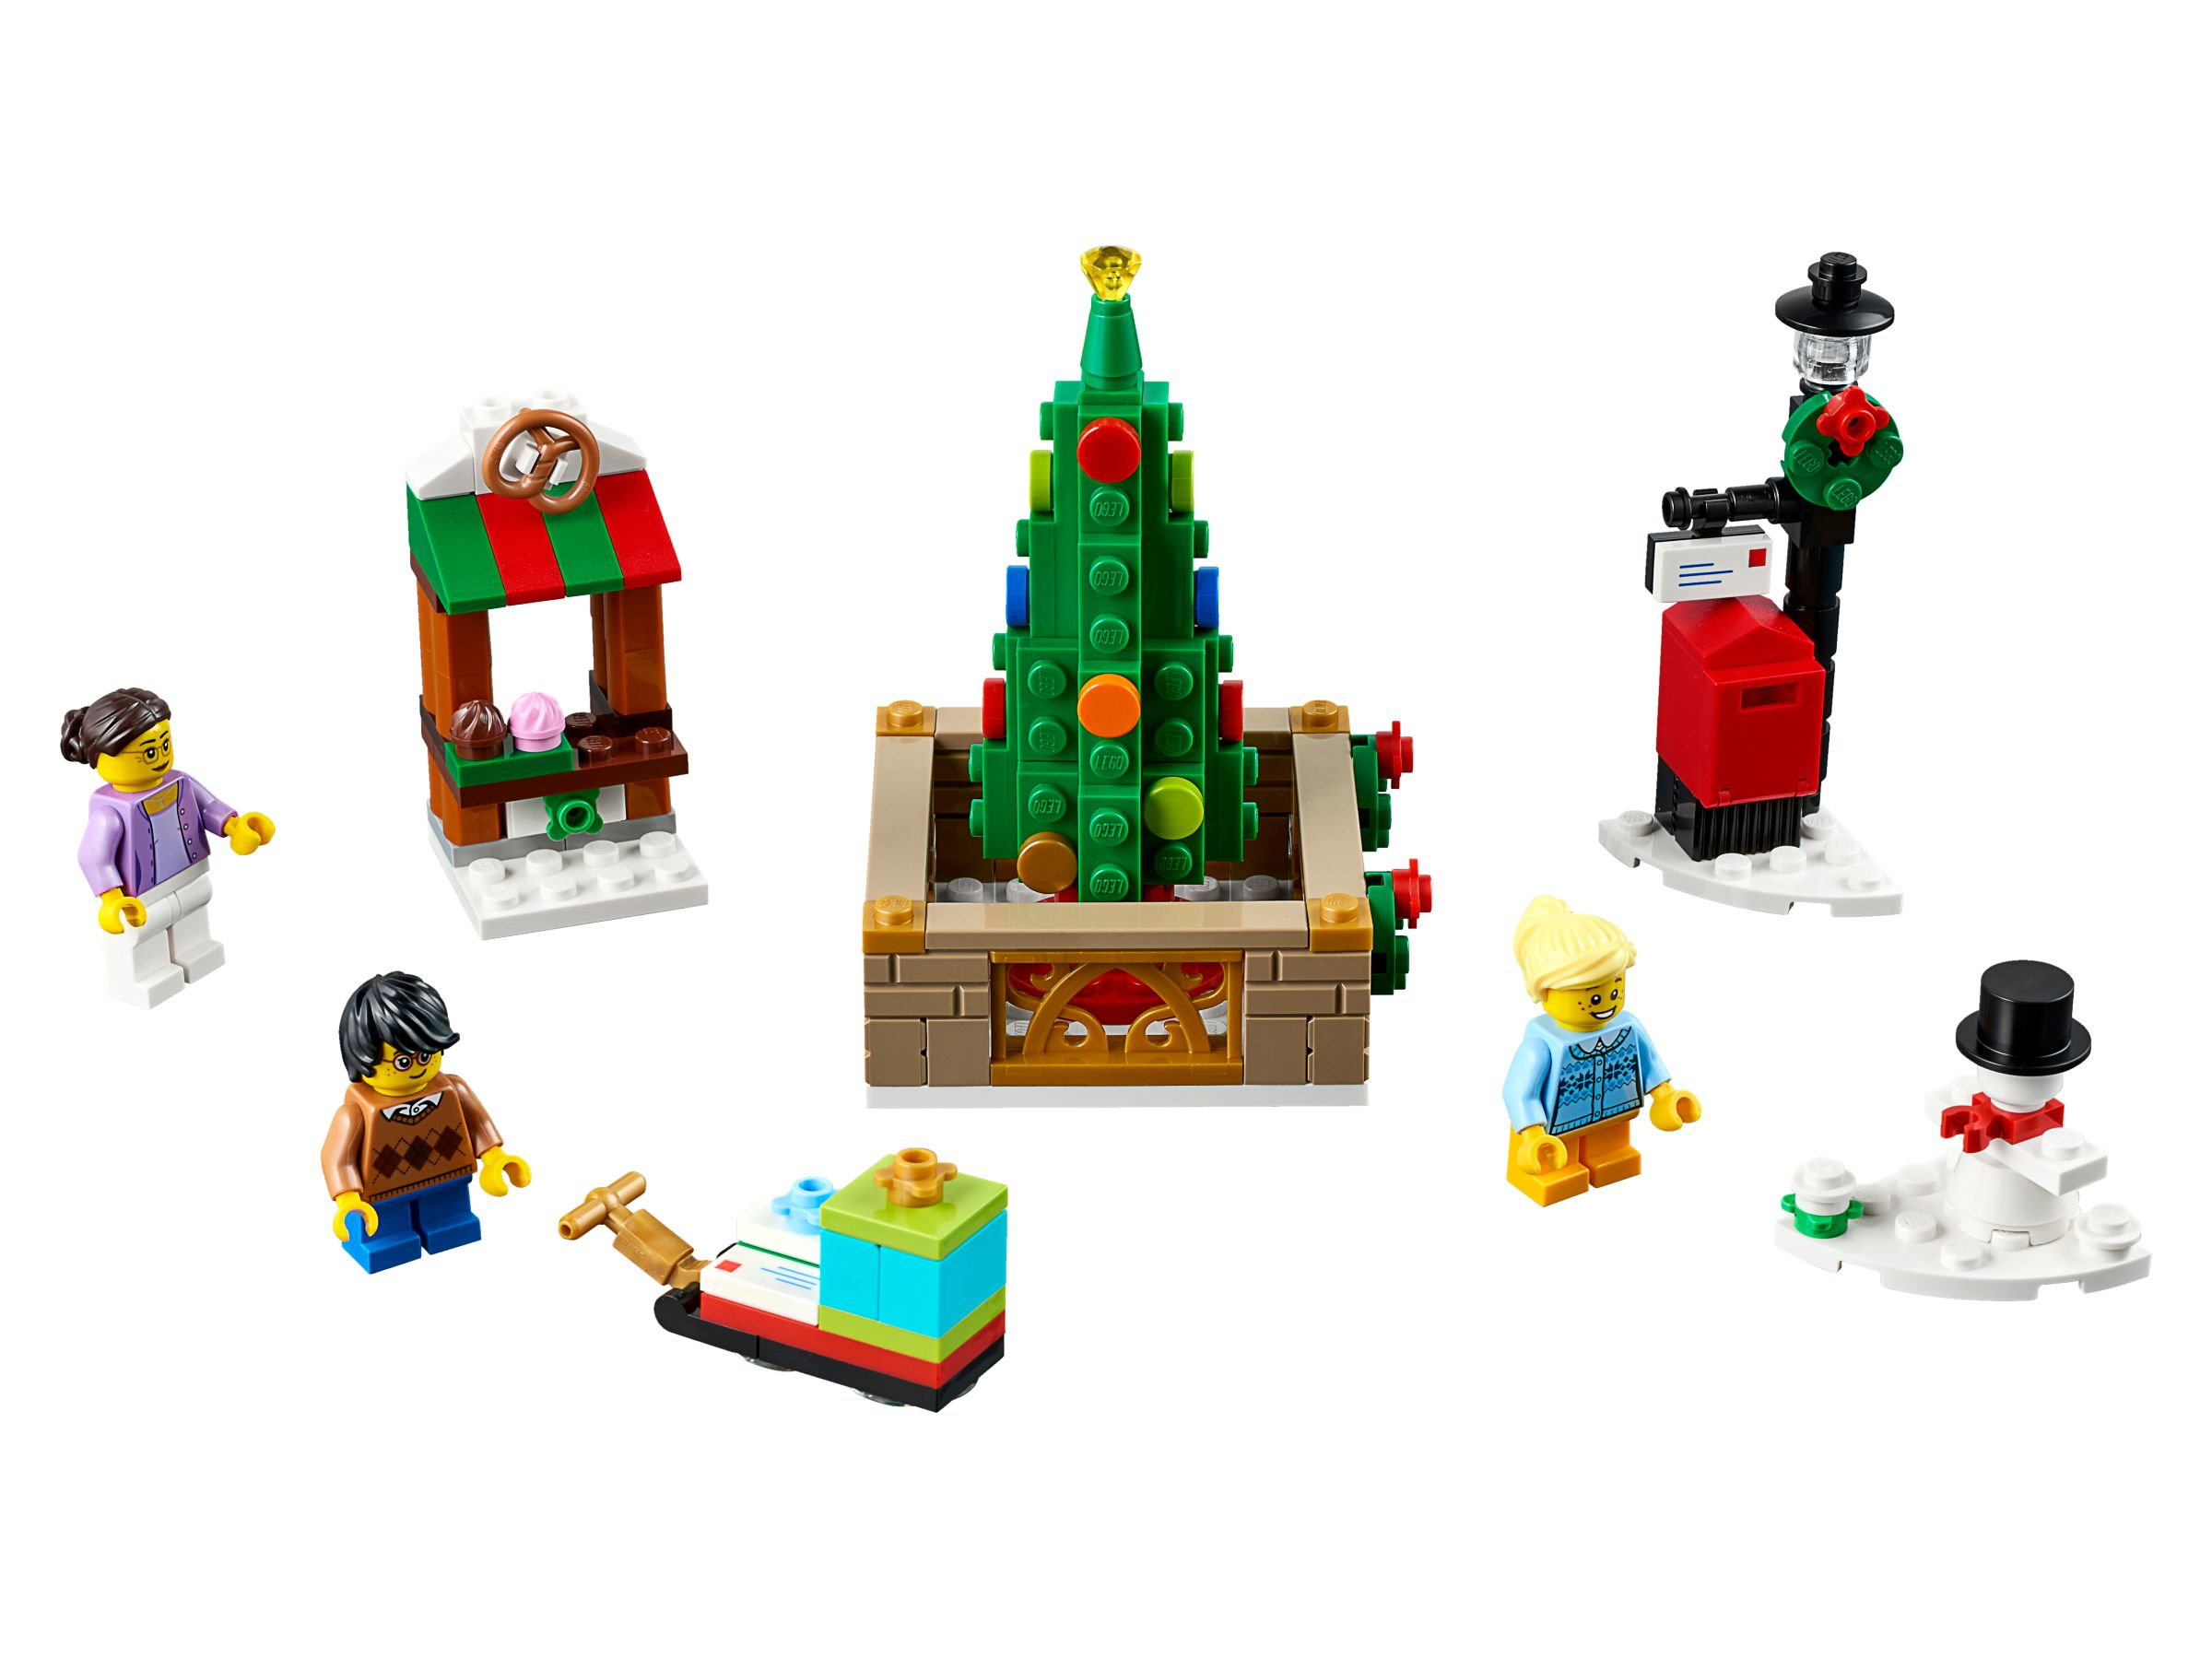 lego 40263 weihnachtsmarkt 2017 seasonal christmas town square brickmerge. Black Bedroom Furniture Sets. Home Design Ideas